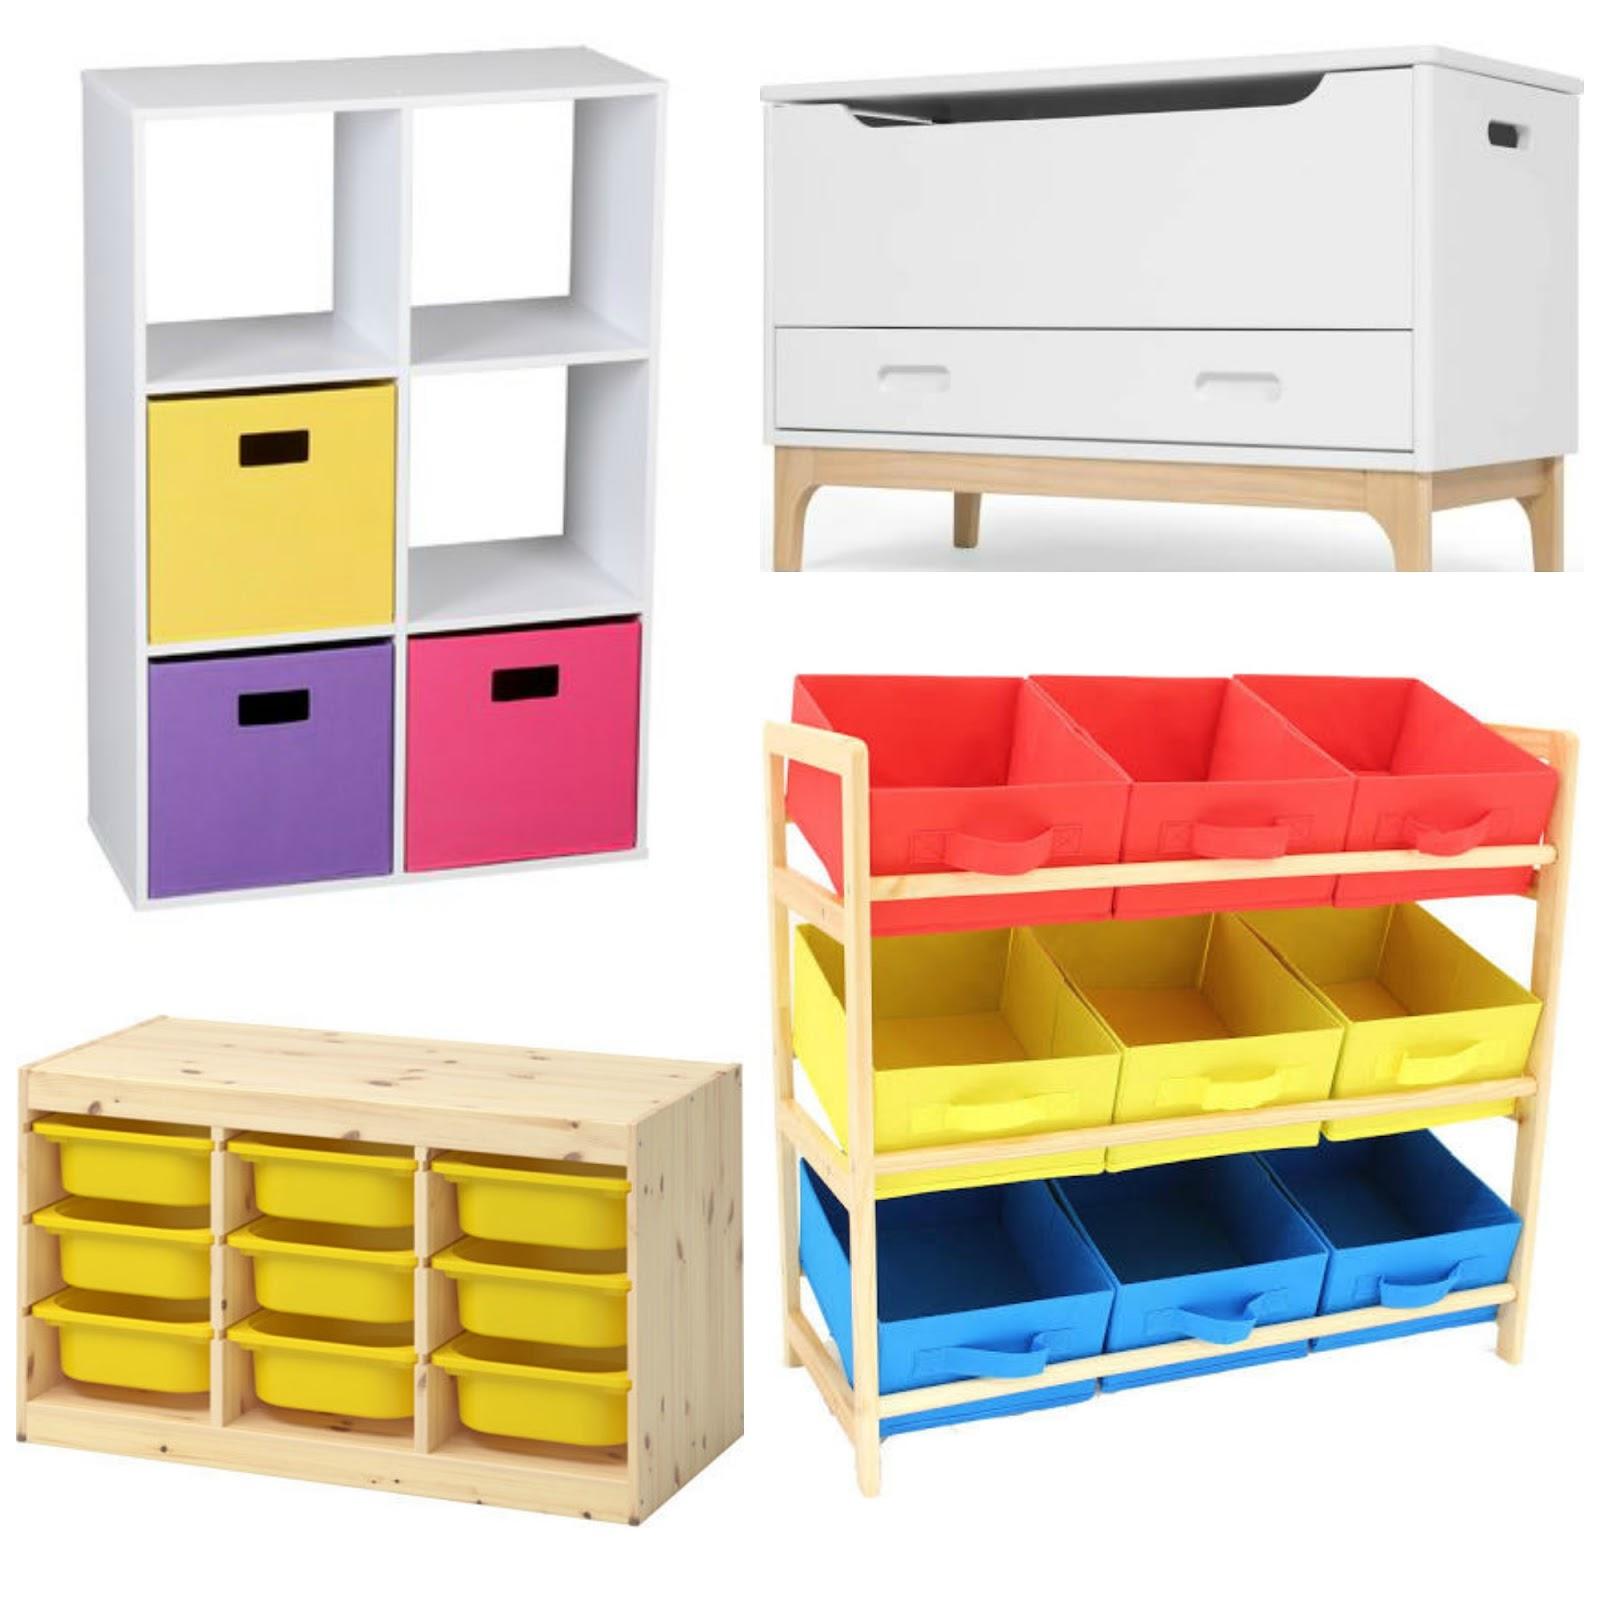 Ikea Kitchen Storage Cubicles